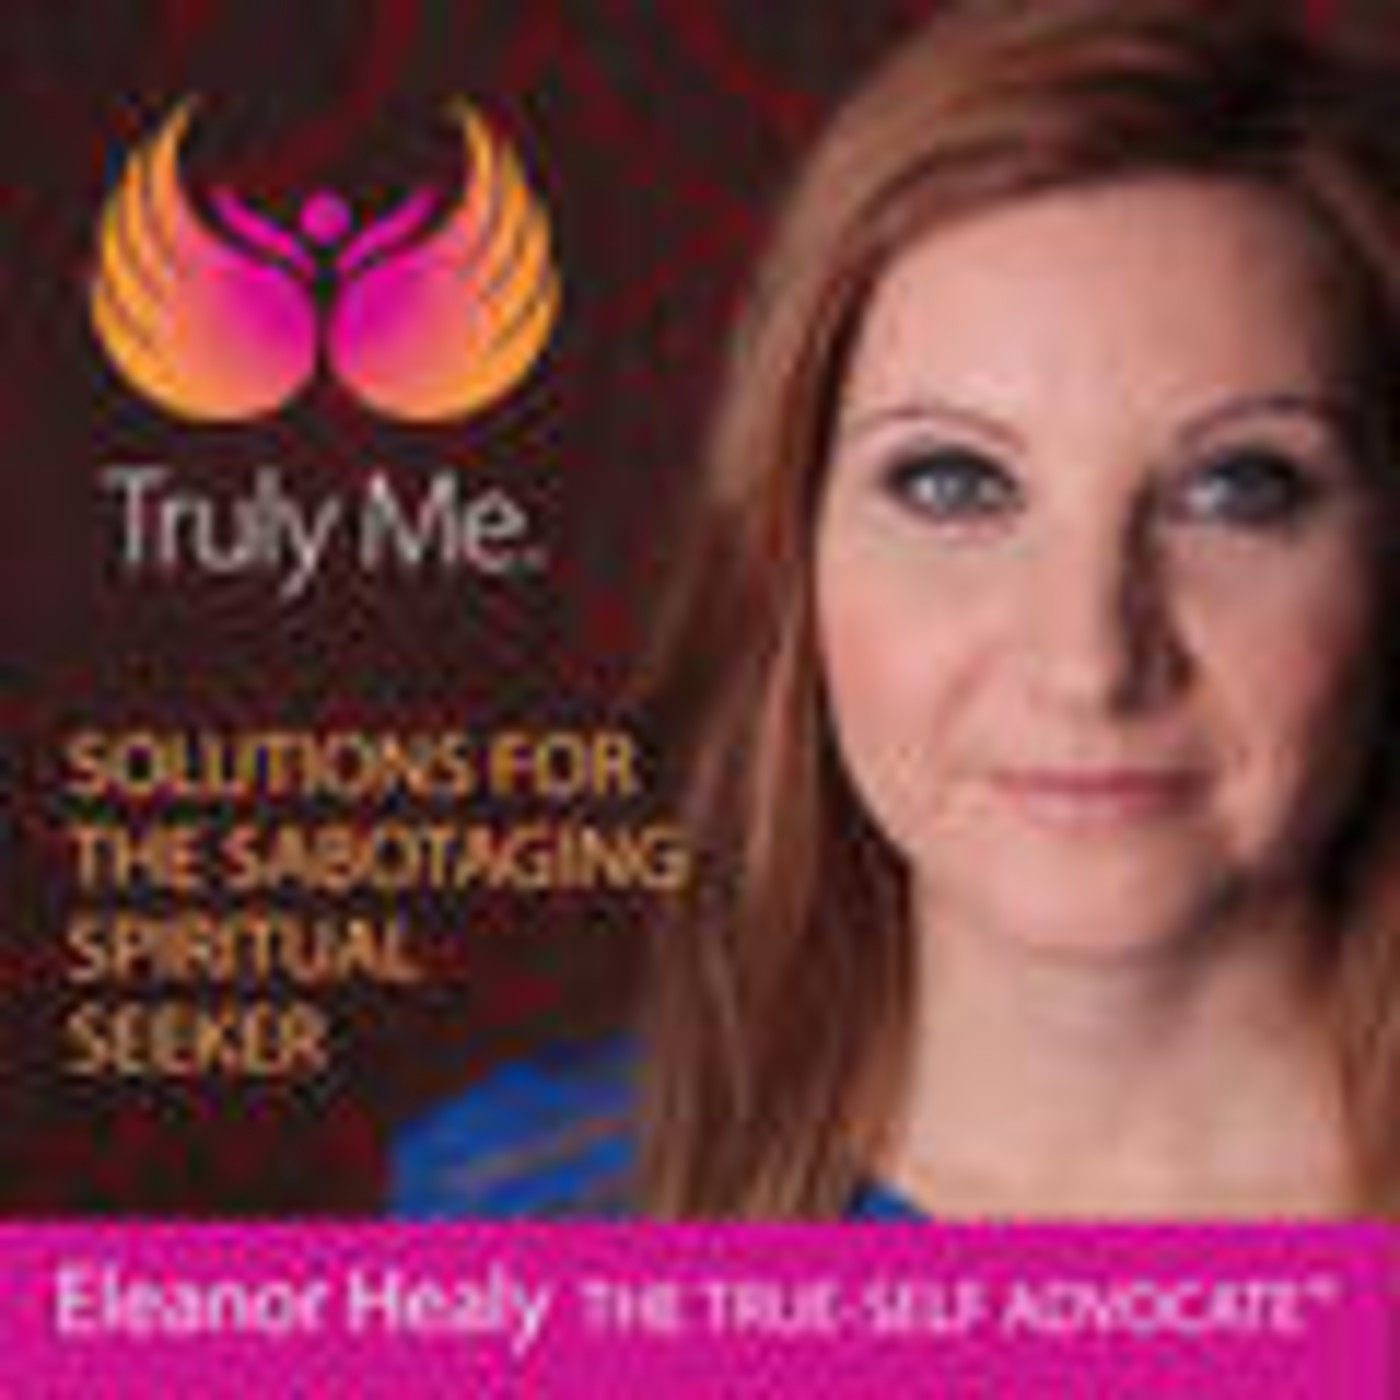 Eleanor Healy, The True-Self A